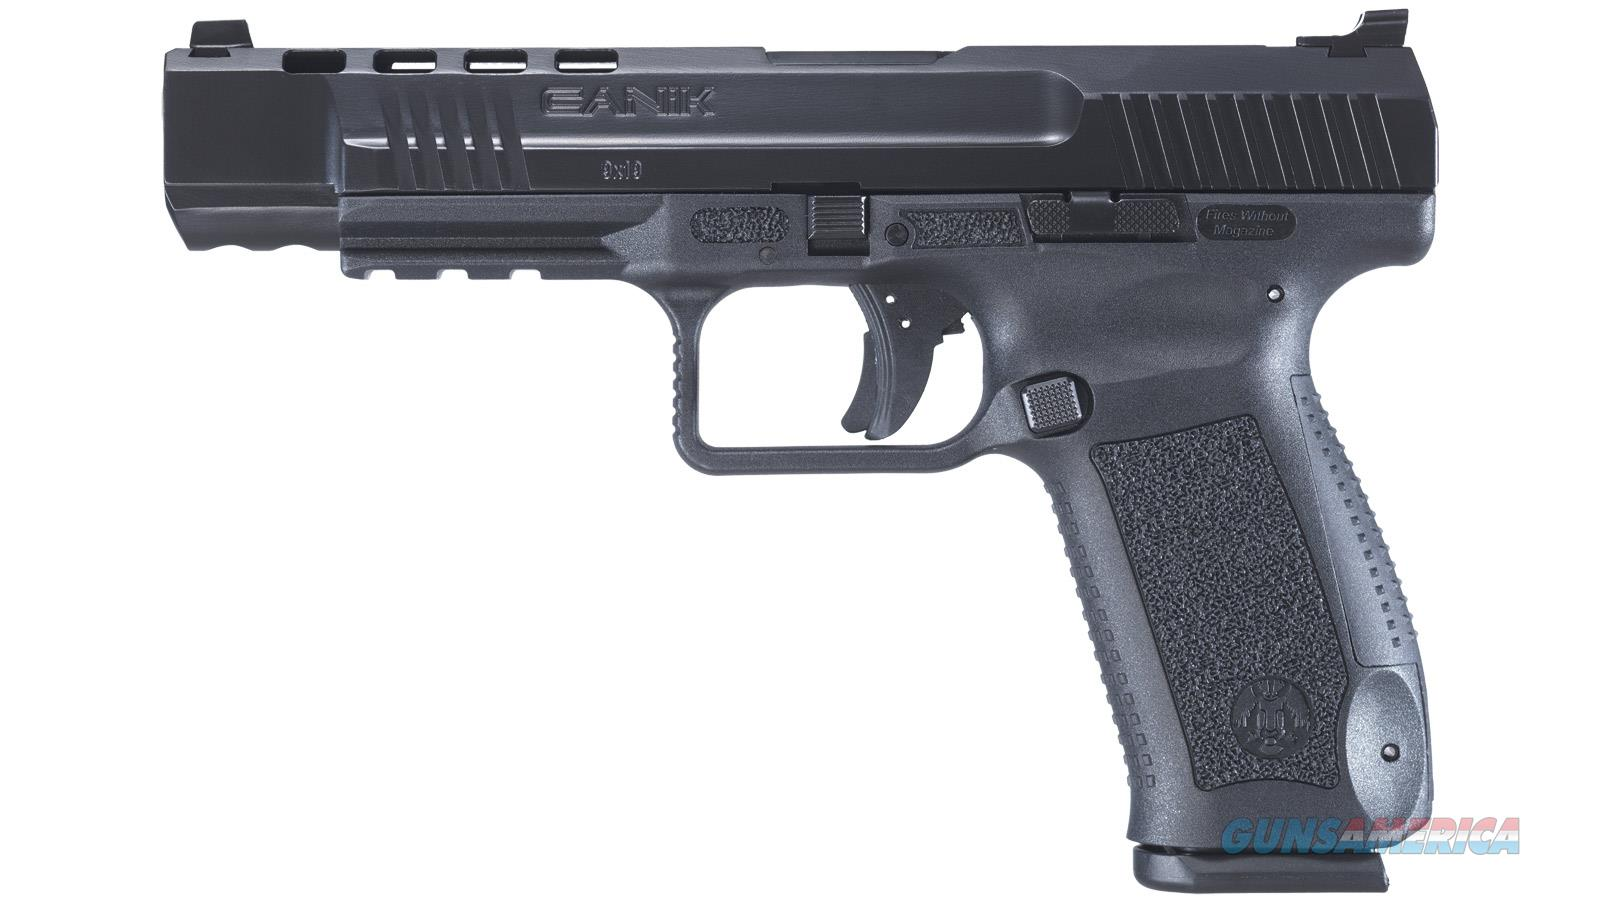 "Canik Usa Canik Tp9sfl 9Mm 5.2"" 10Rd HG4583-N  Guns > Pistols > Canik USA Pistols"